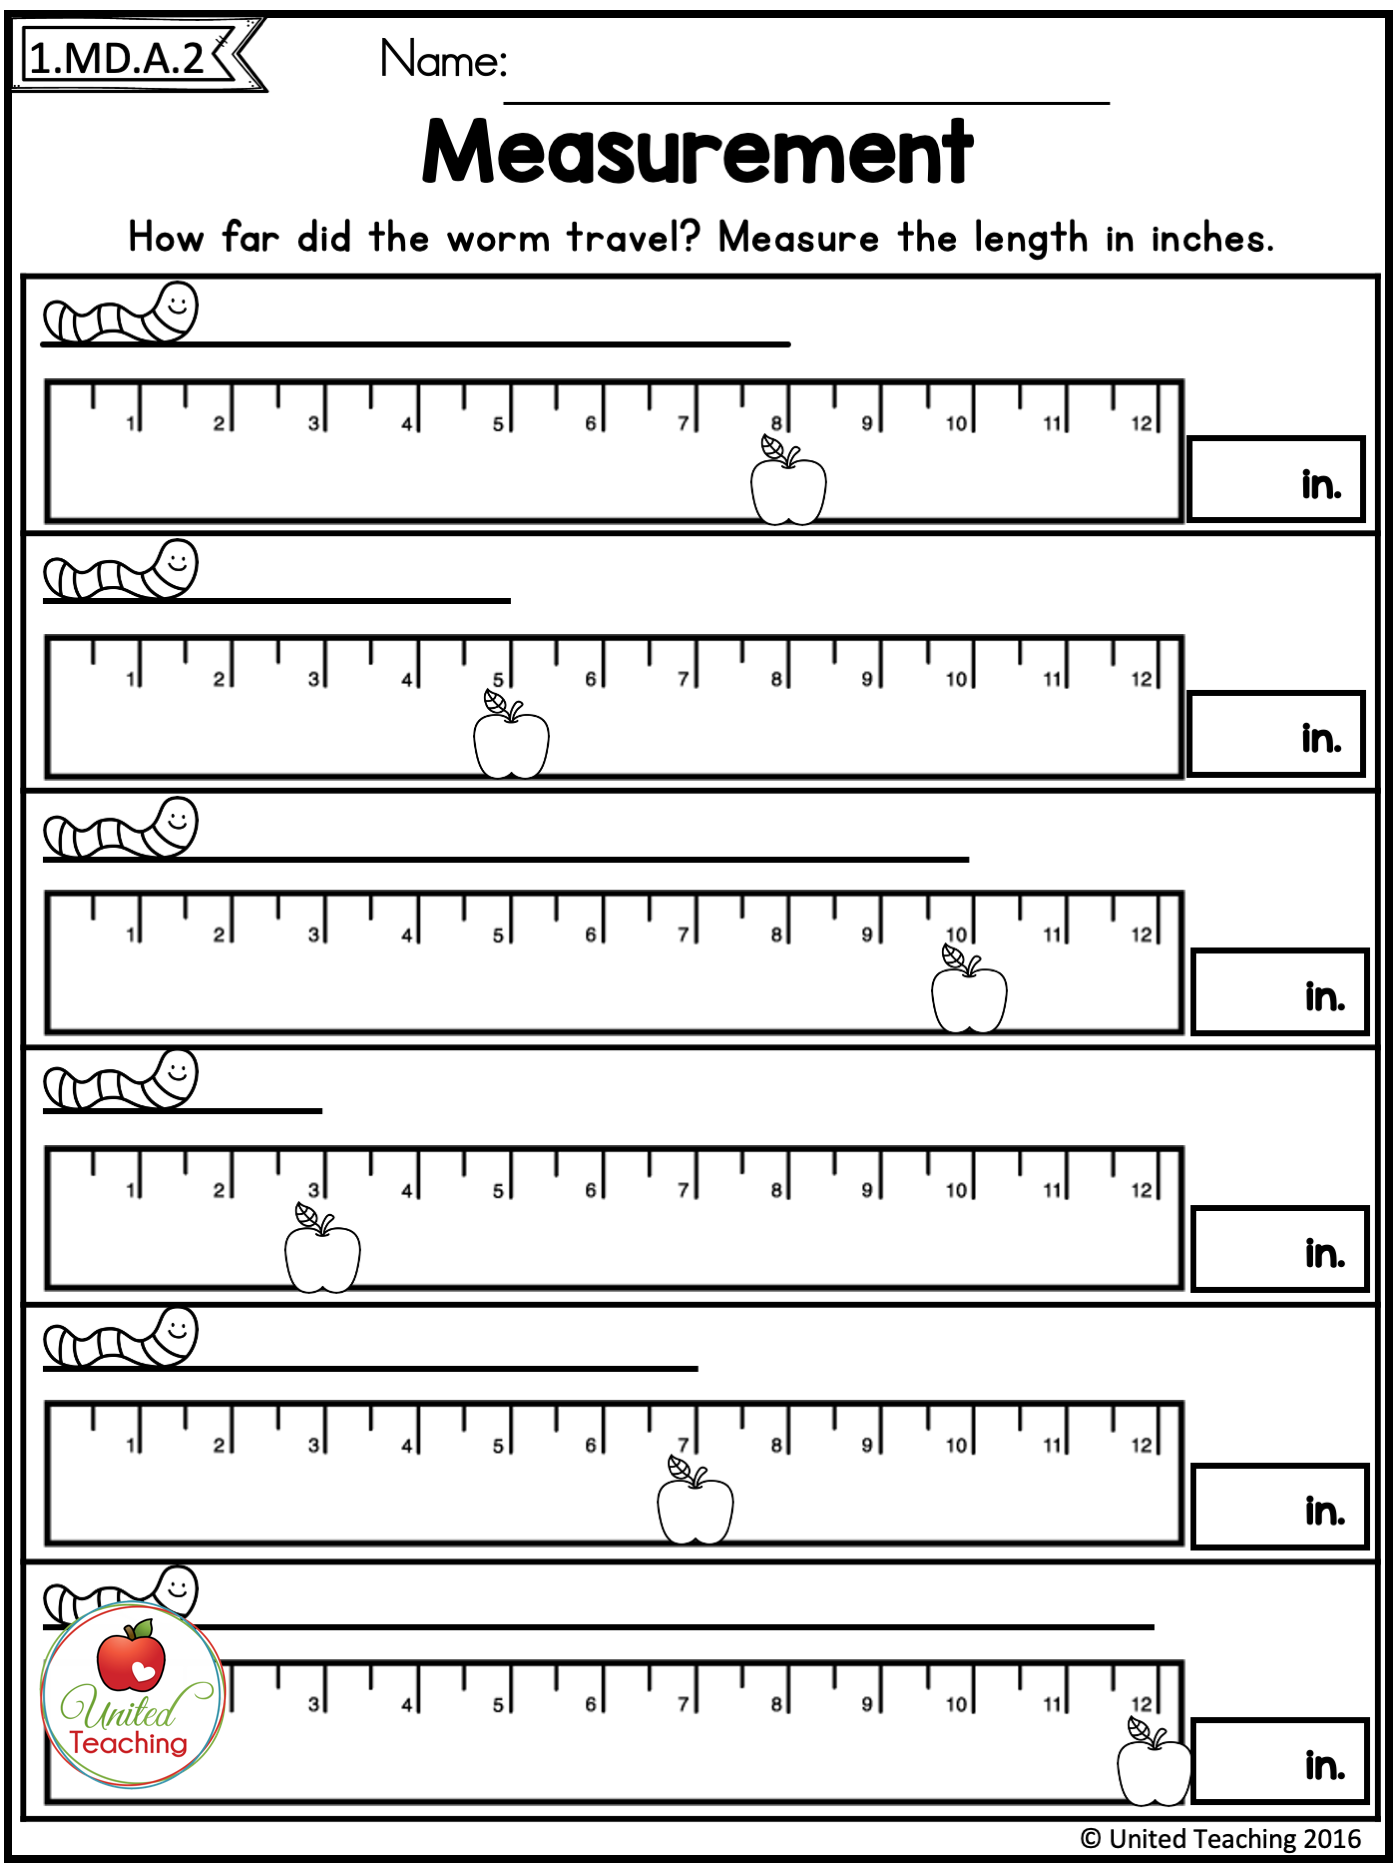 medium resolution of FALL MATH ACTIVITIES (1ST GRADE) - United Teaching   Measurement  activities